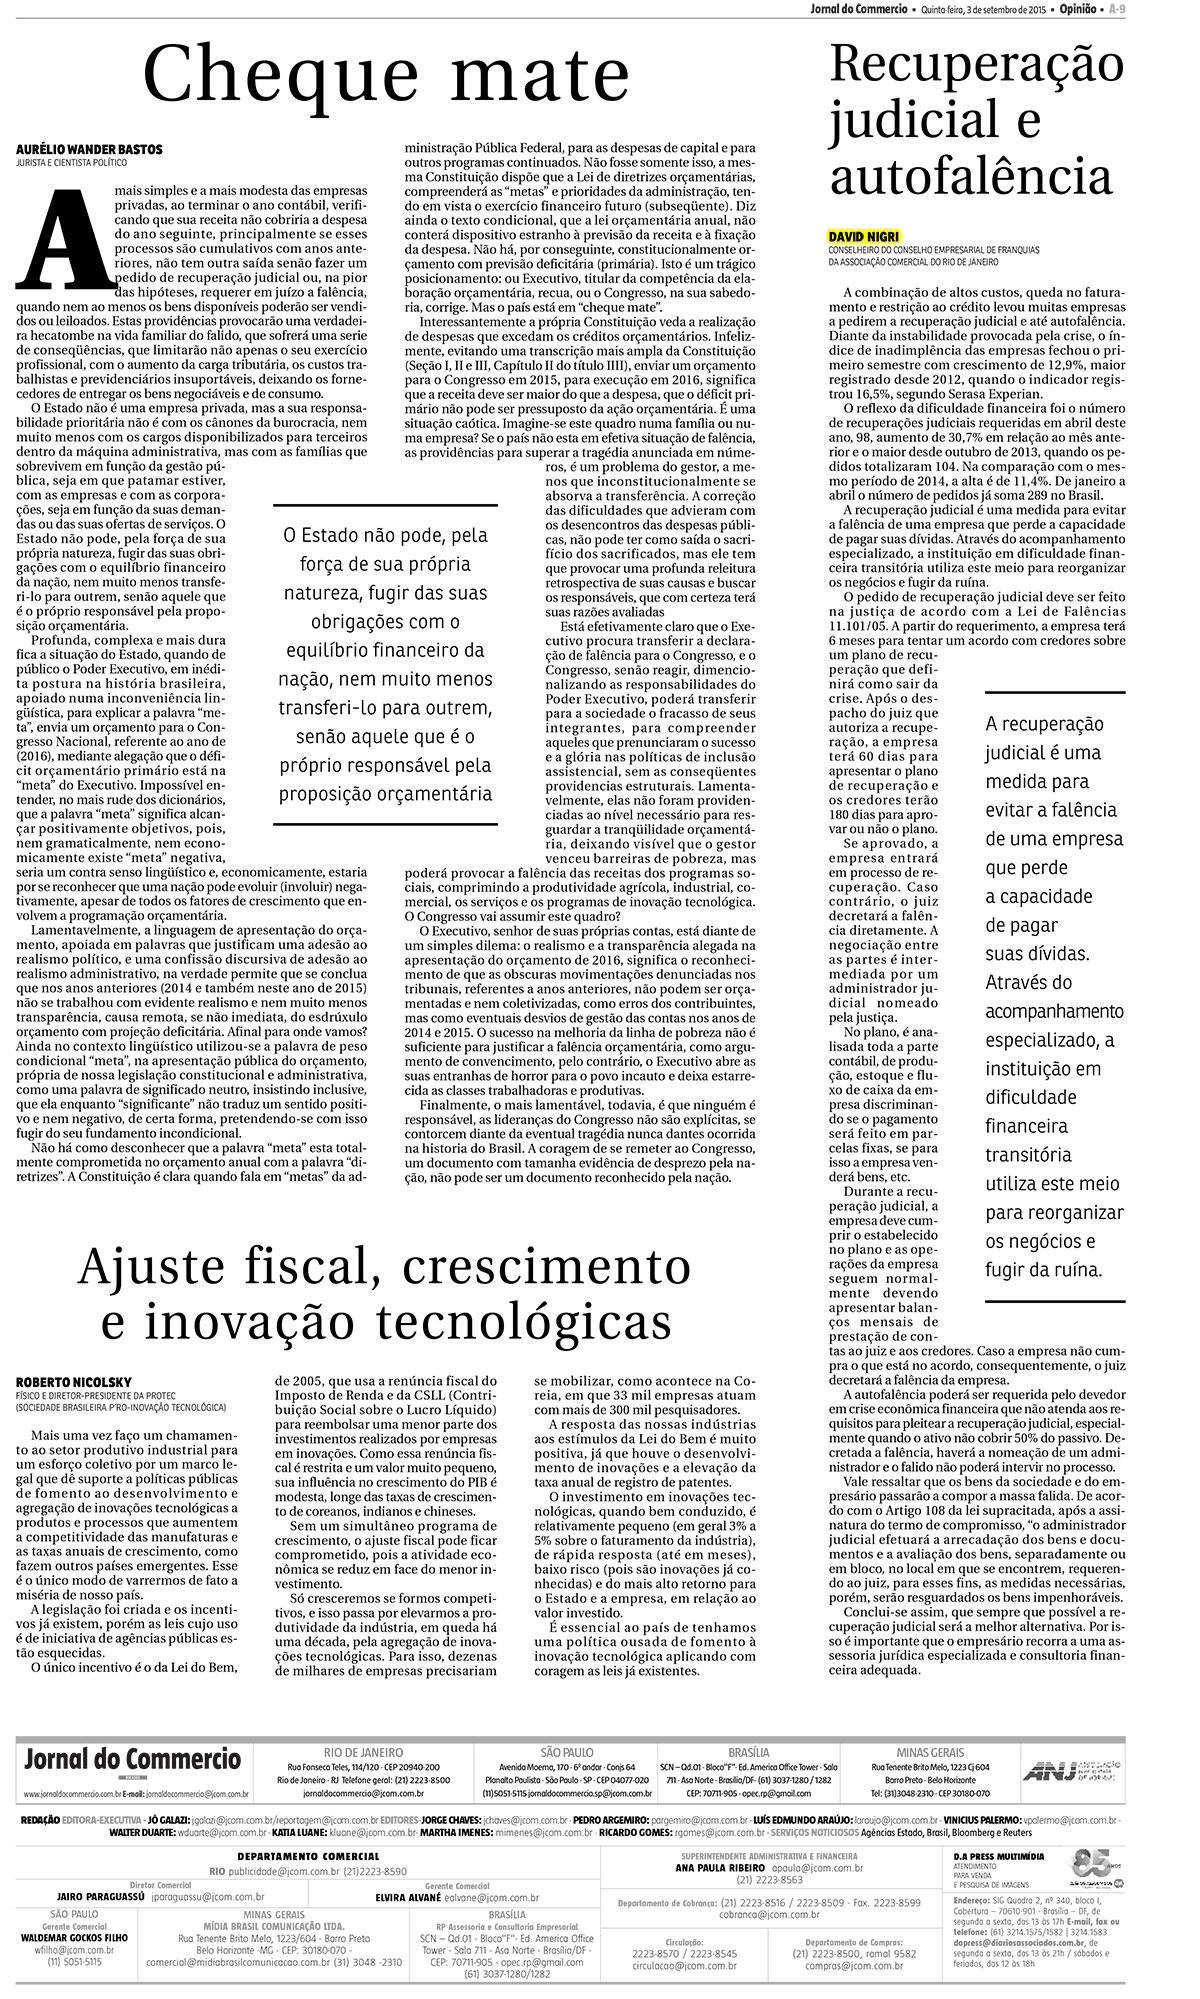 Jornal_Commercio_Falencia